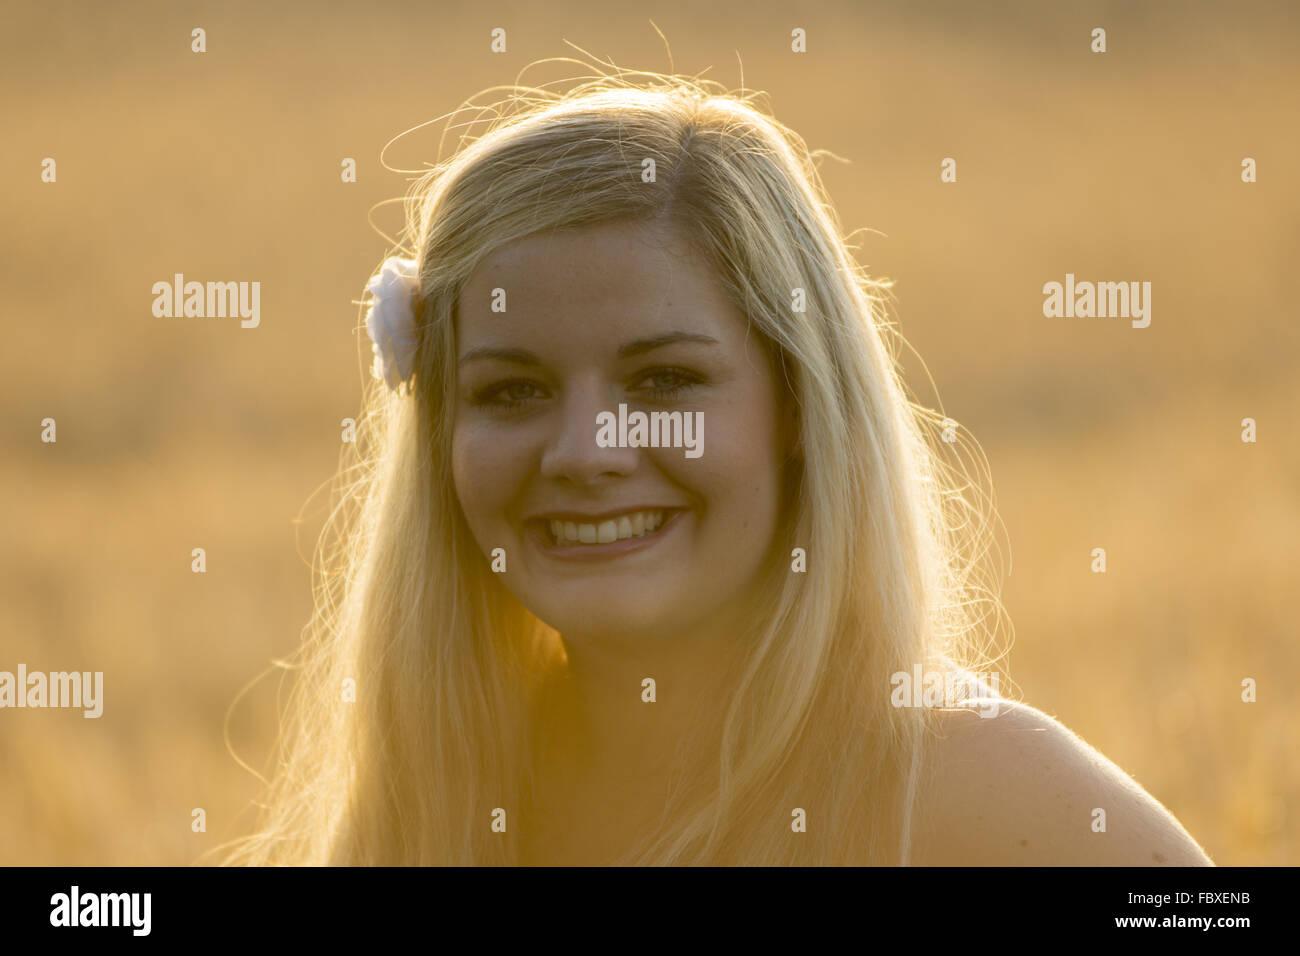 Retrato junge Frau im Abendlicht Imagens de Stock